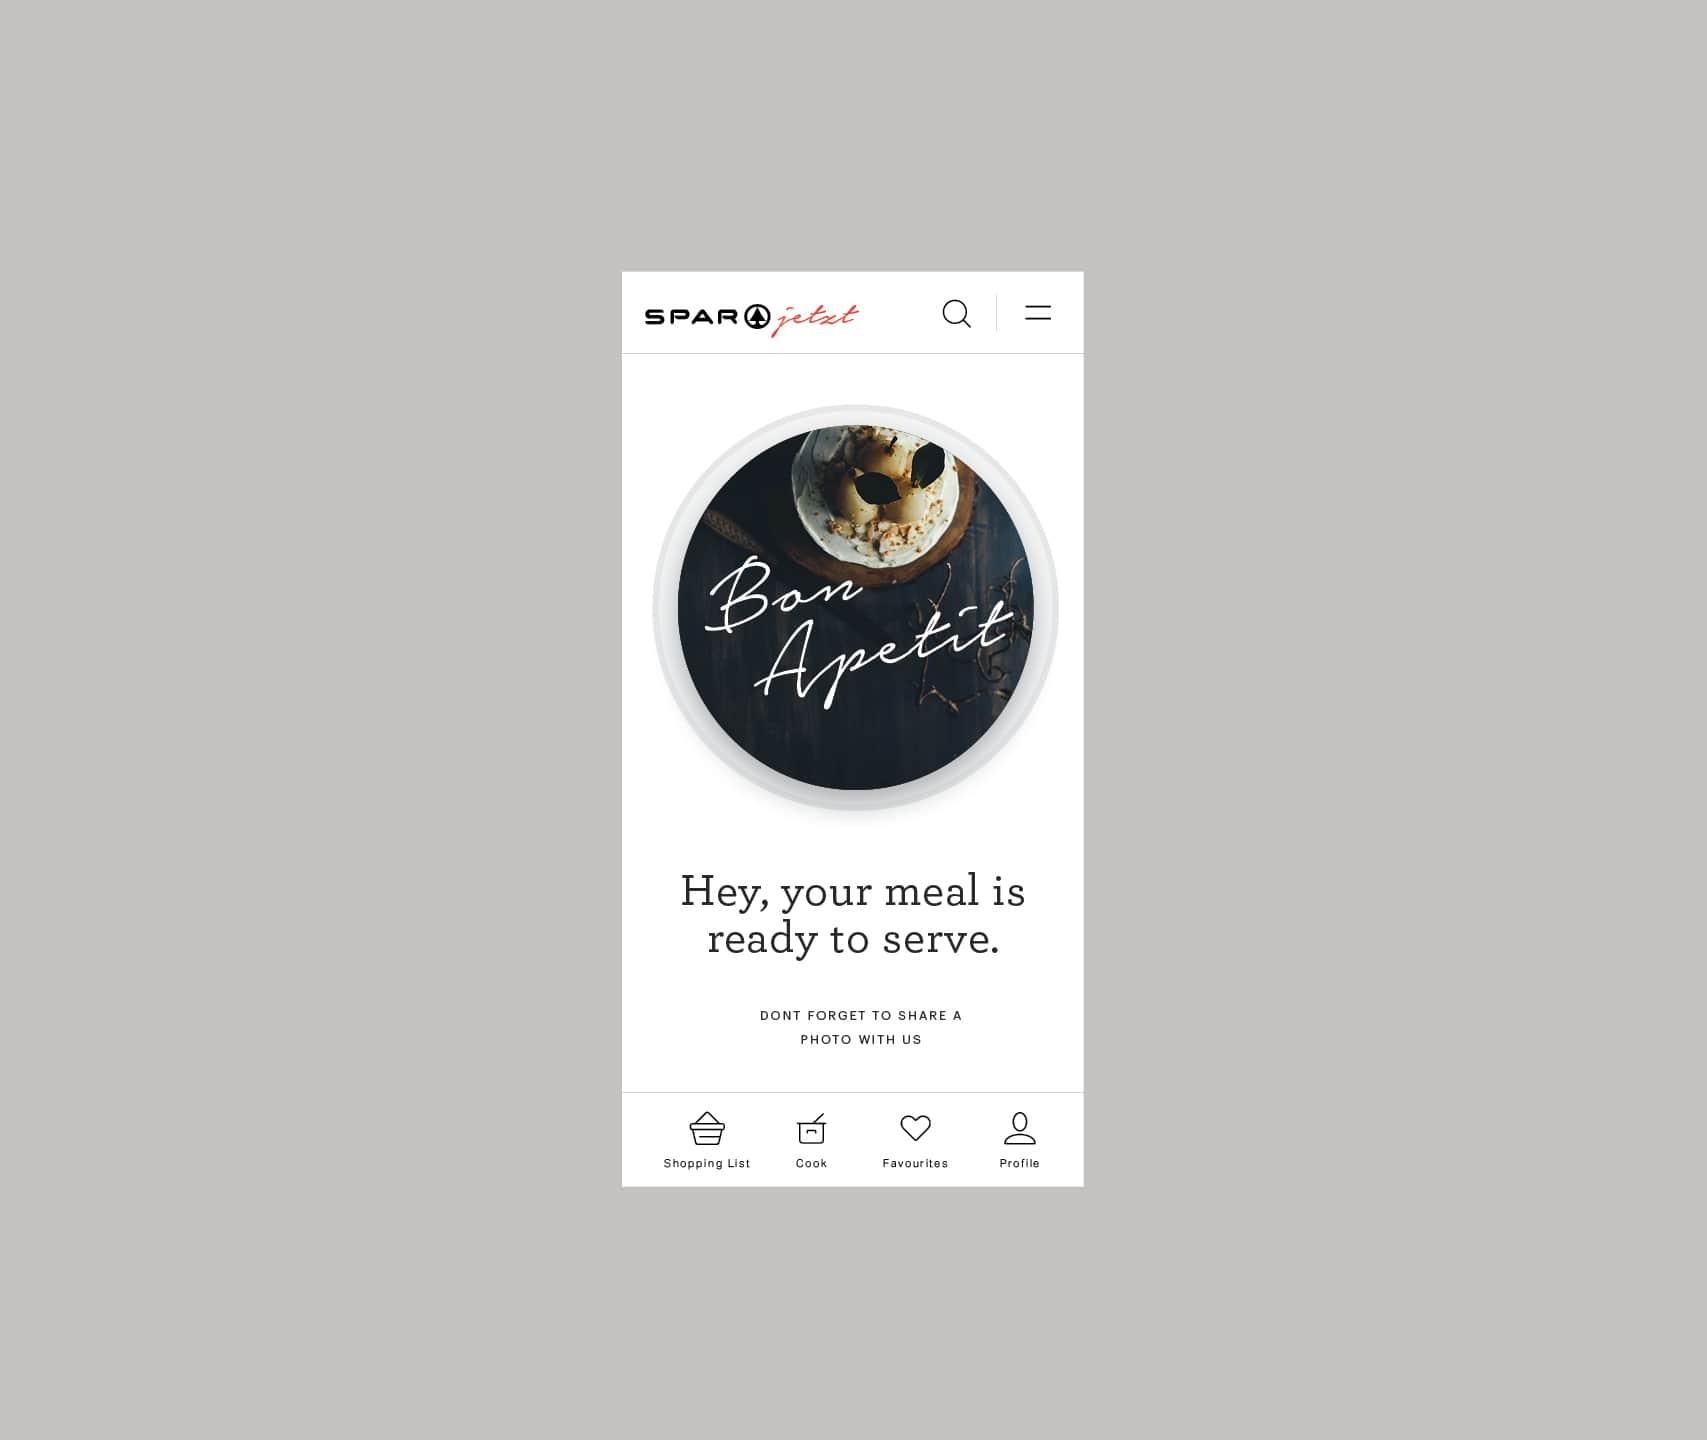 mantik-digital-branding-development-agency-chocolate-packaging-webdesign-design-app-ui-shopping-grocery-store10-min